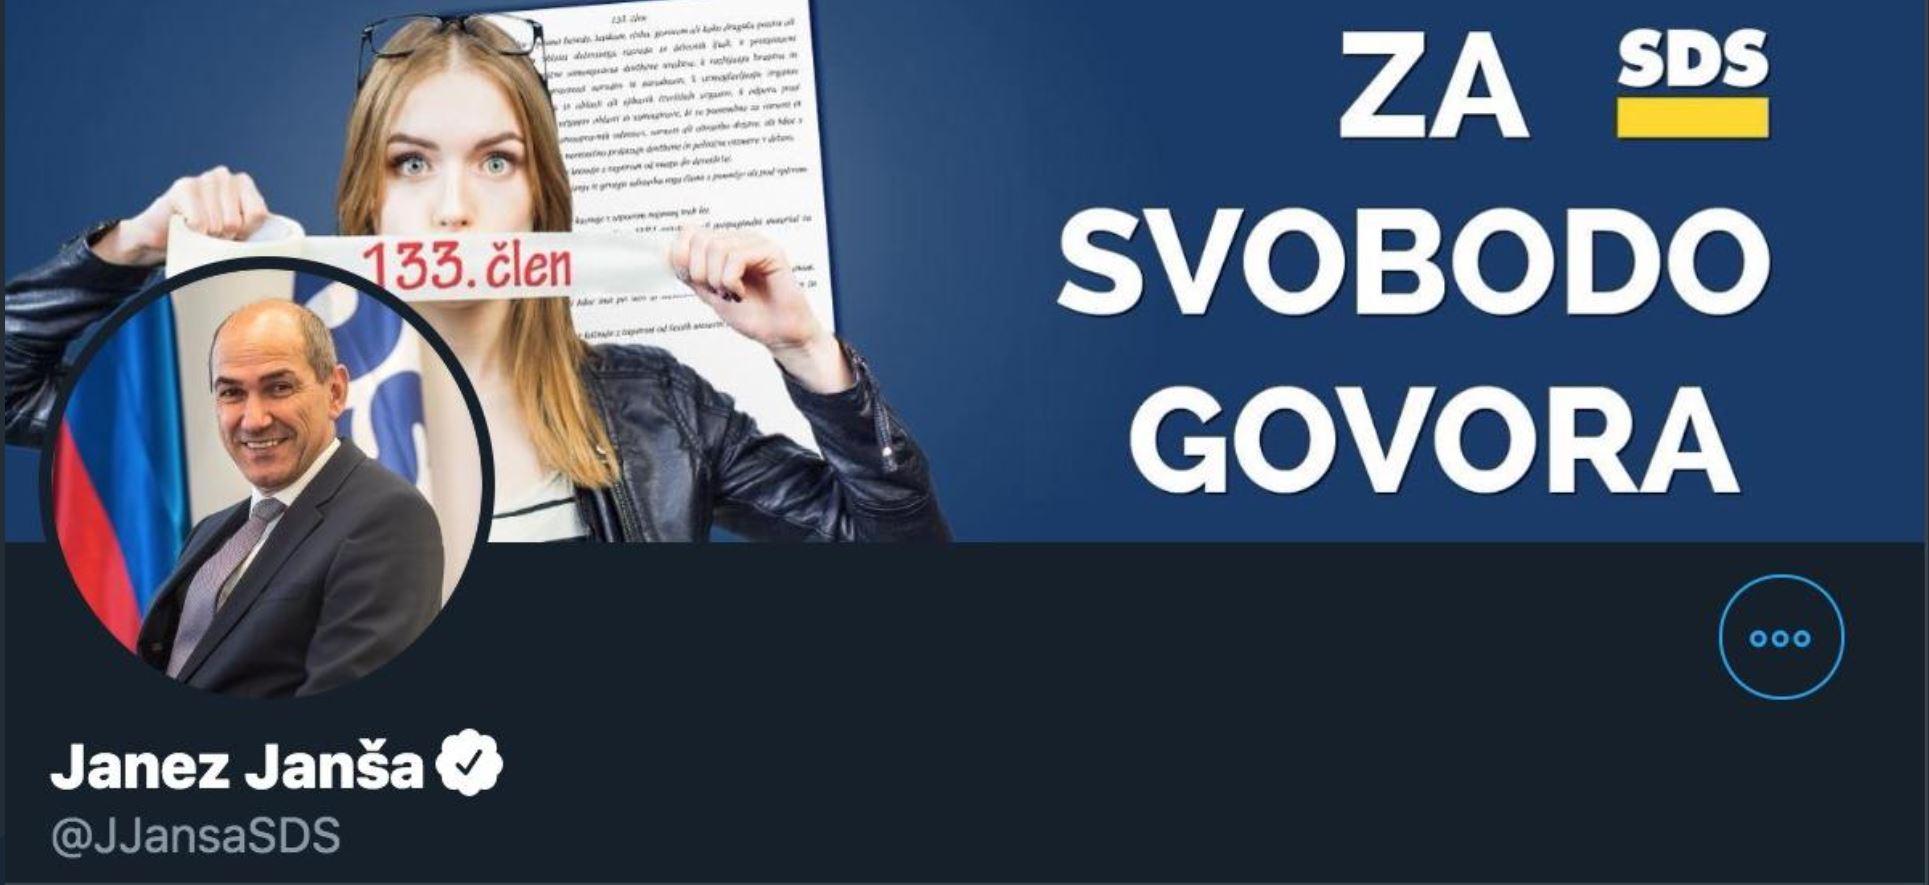 SDS - kampanja za svobodo govora